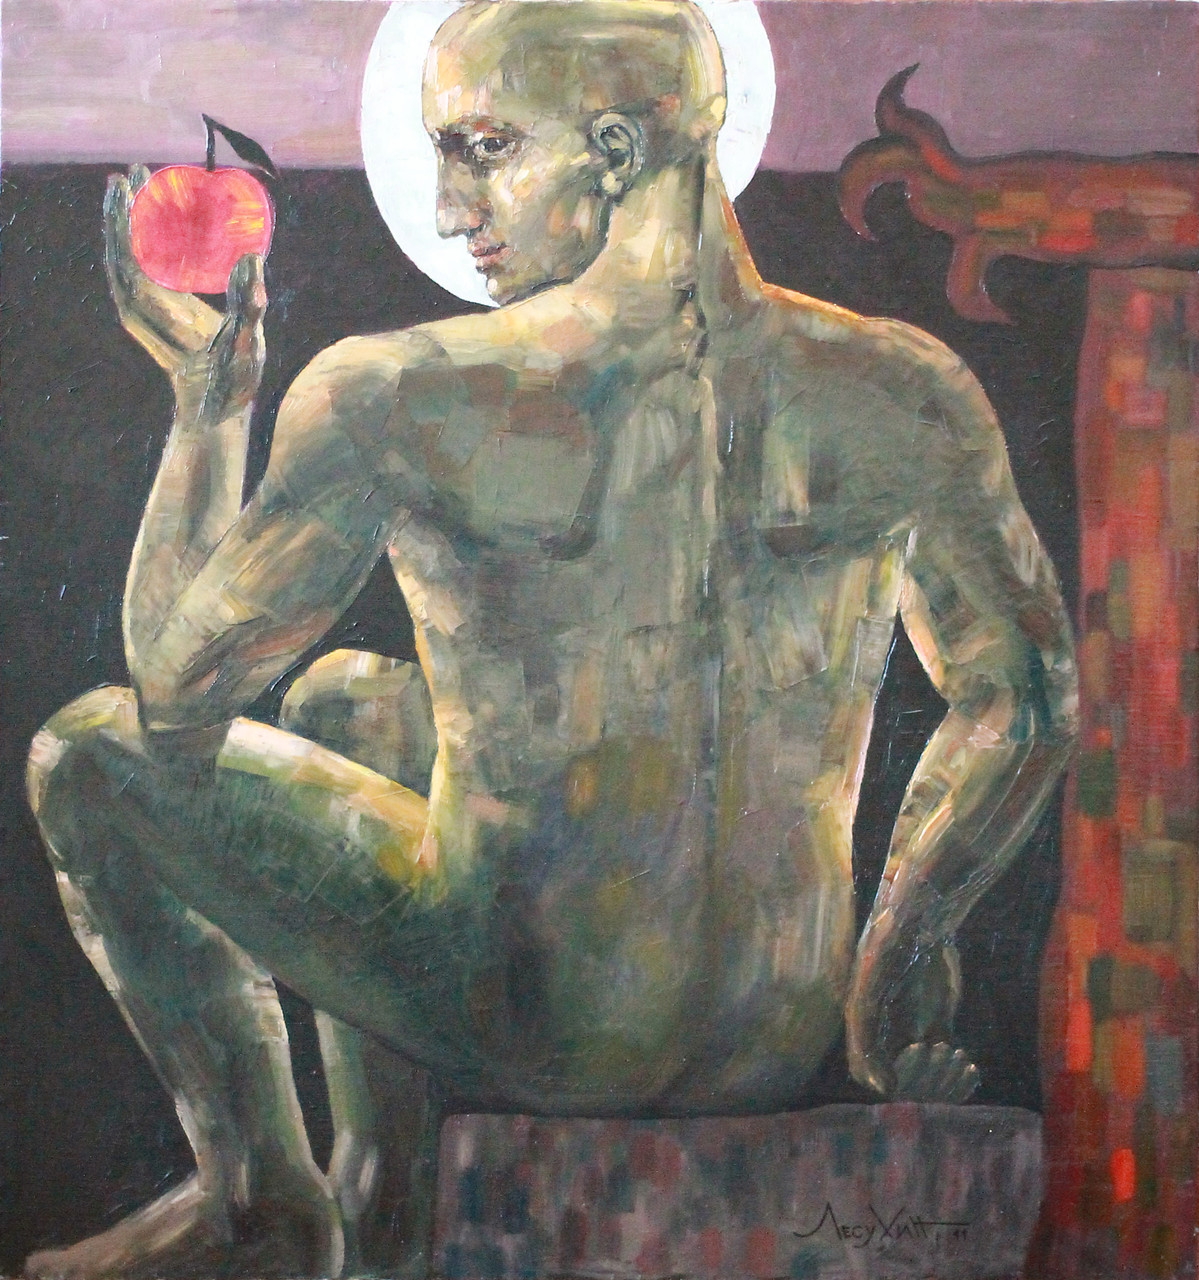 Григорий Лесухин.     Яблоко (Адам).     2013 г.      Холст, масло.      90х90 см.